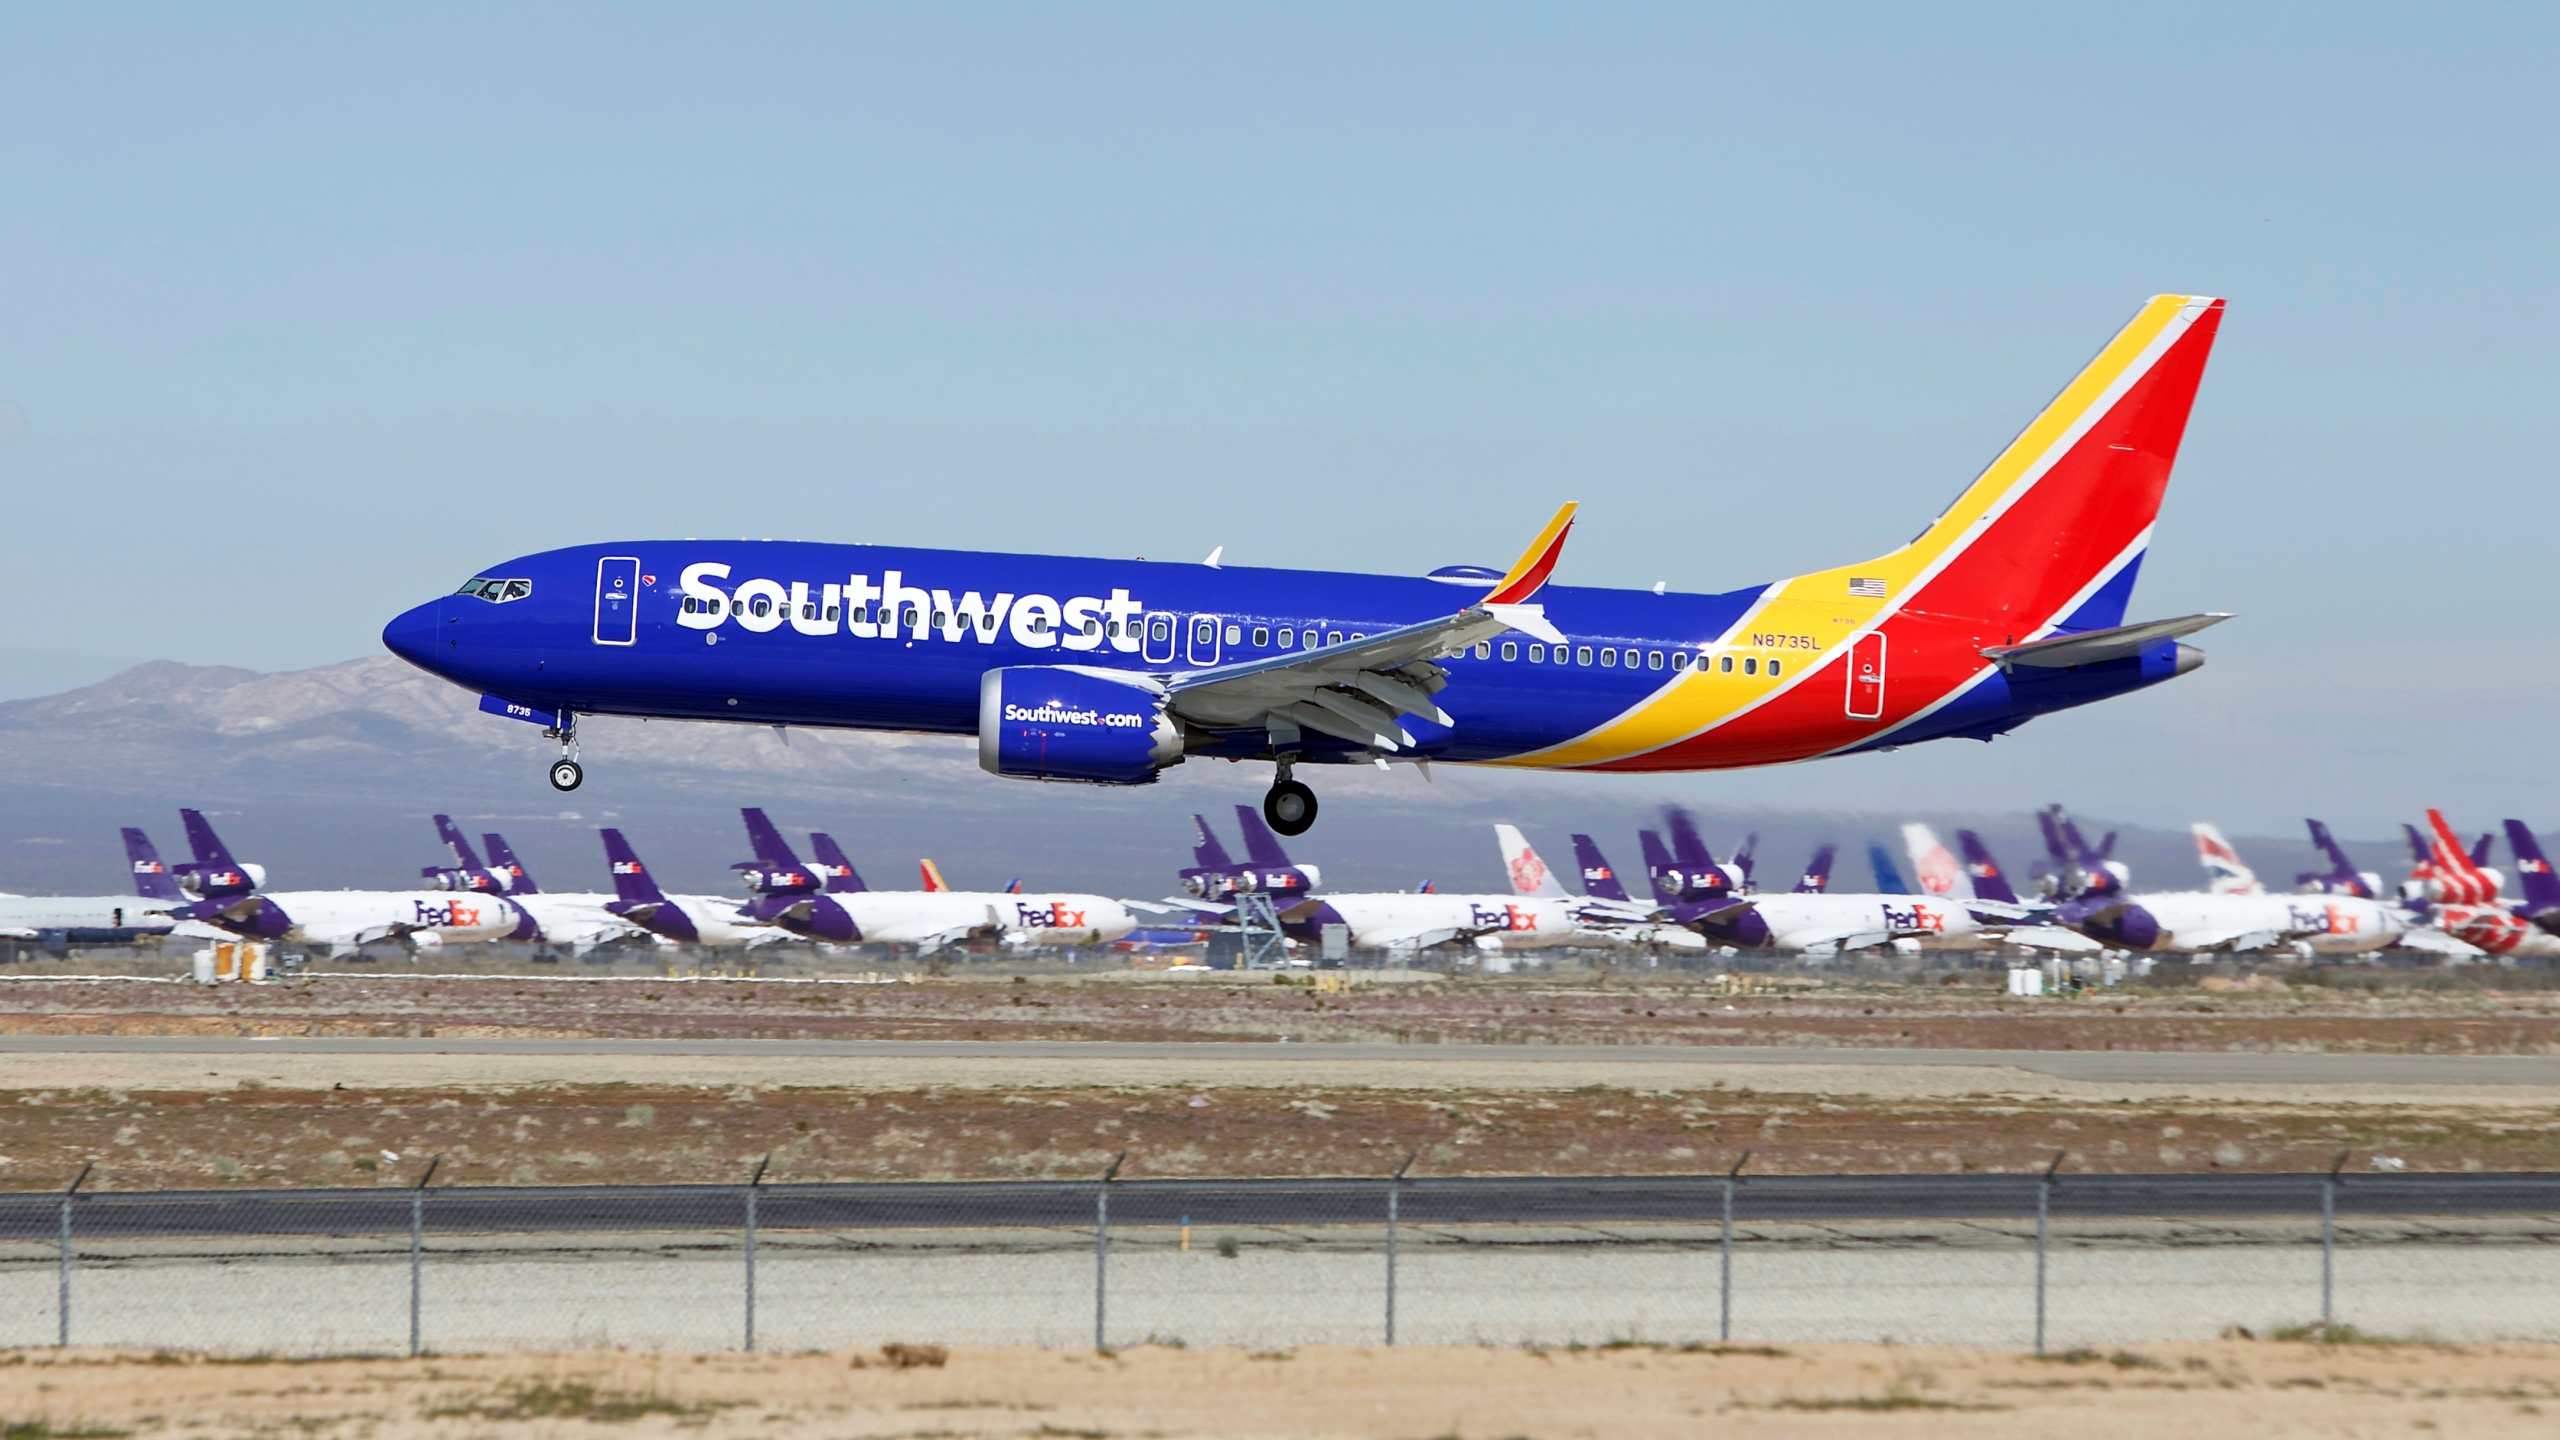 Southwest_Grounded_Jets_56217-159532.jpg39682166